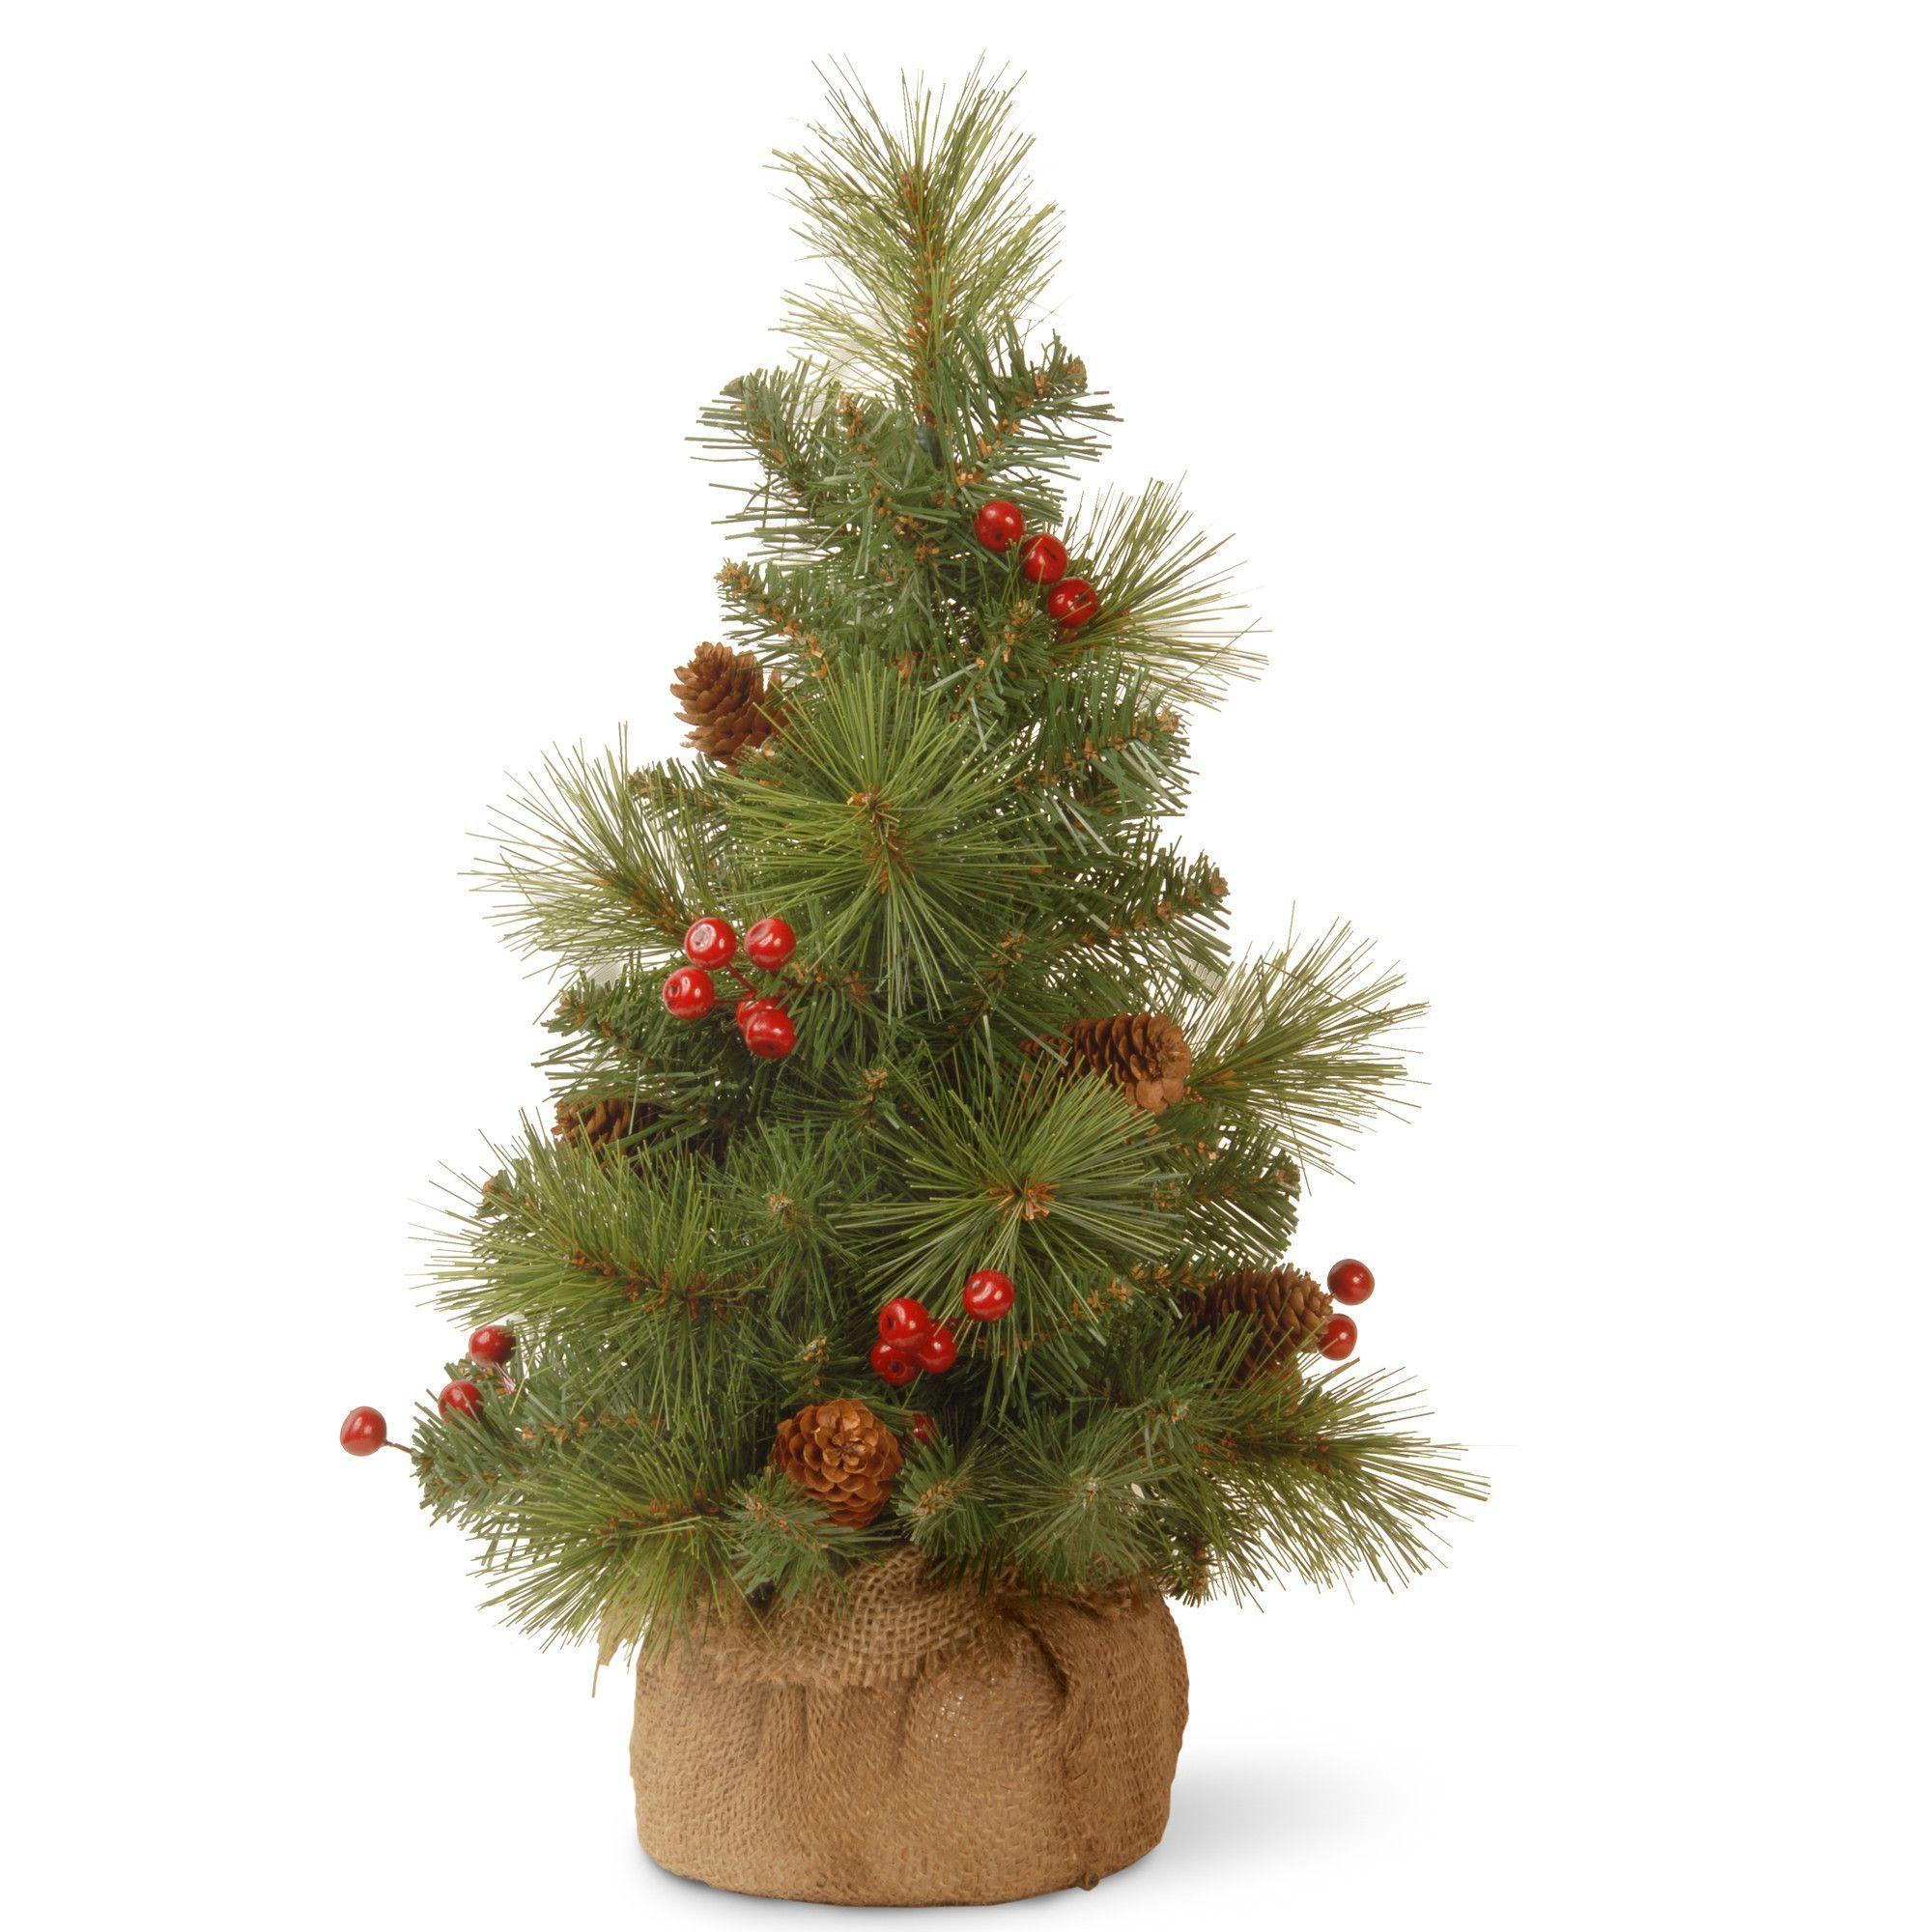 "Miniature 18"" Green Pine Artificial Christmas Tree"